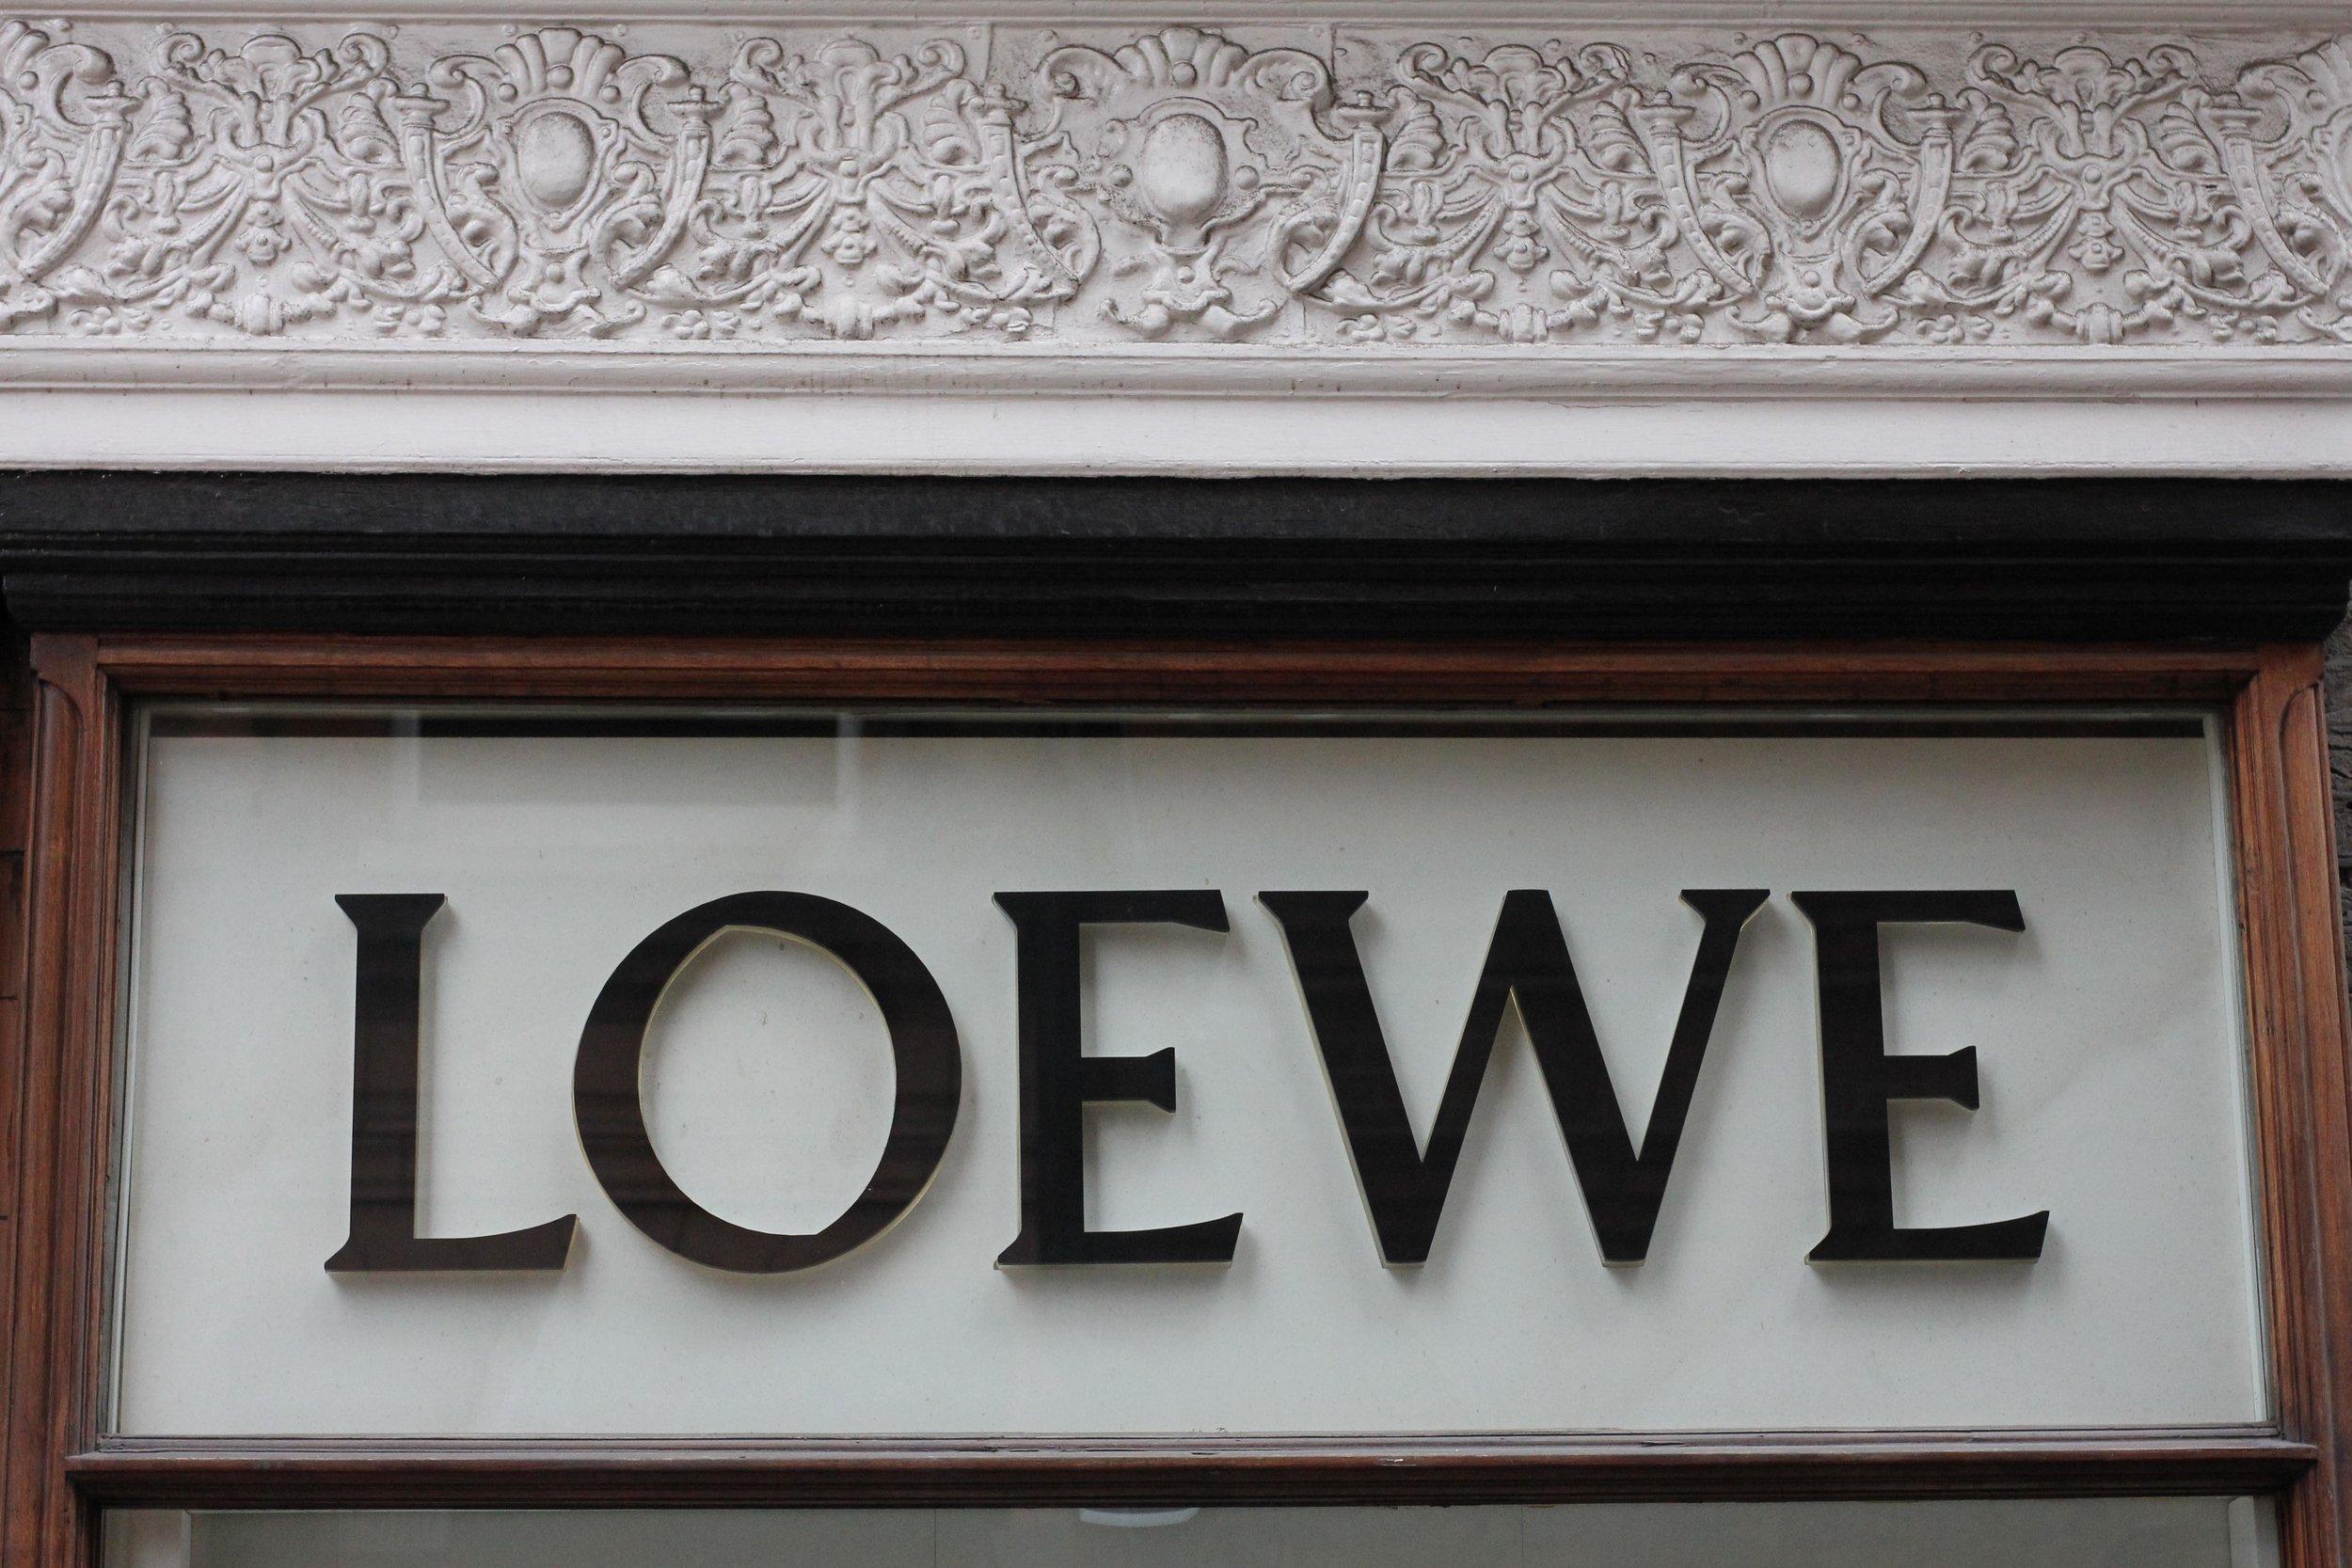 loewe-london-mayfair-rolandas-lusinskis-bones-and-bruises